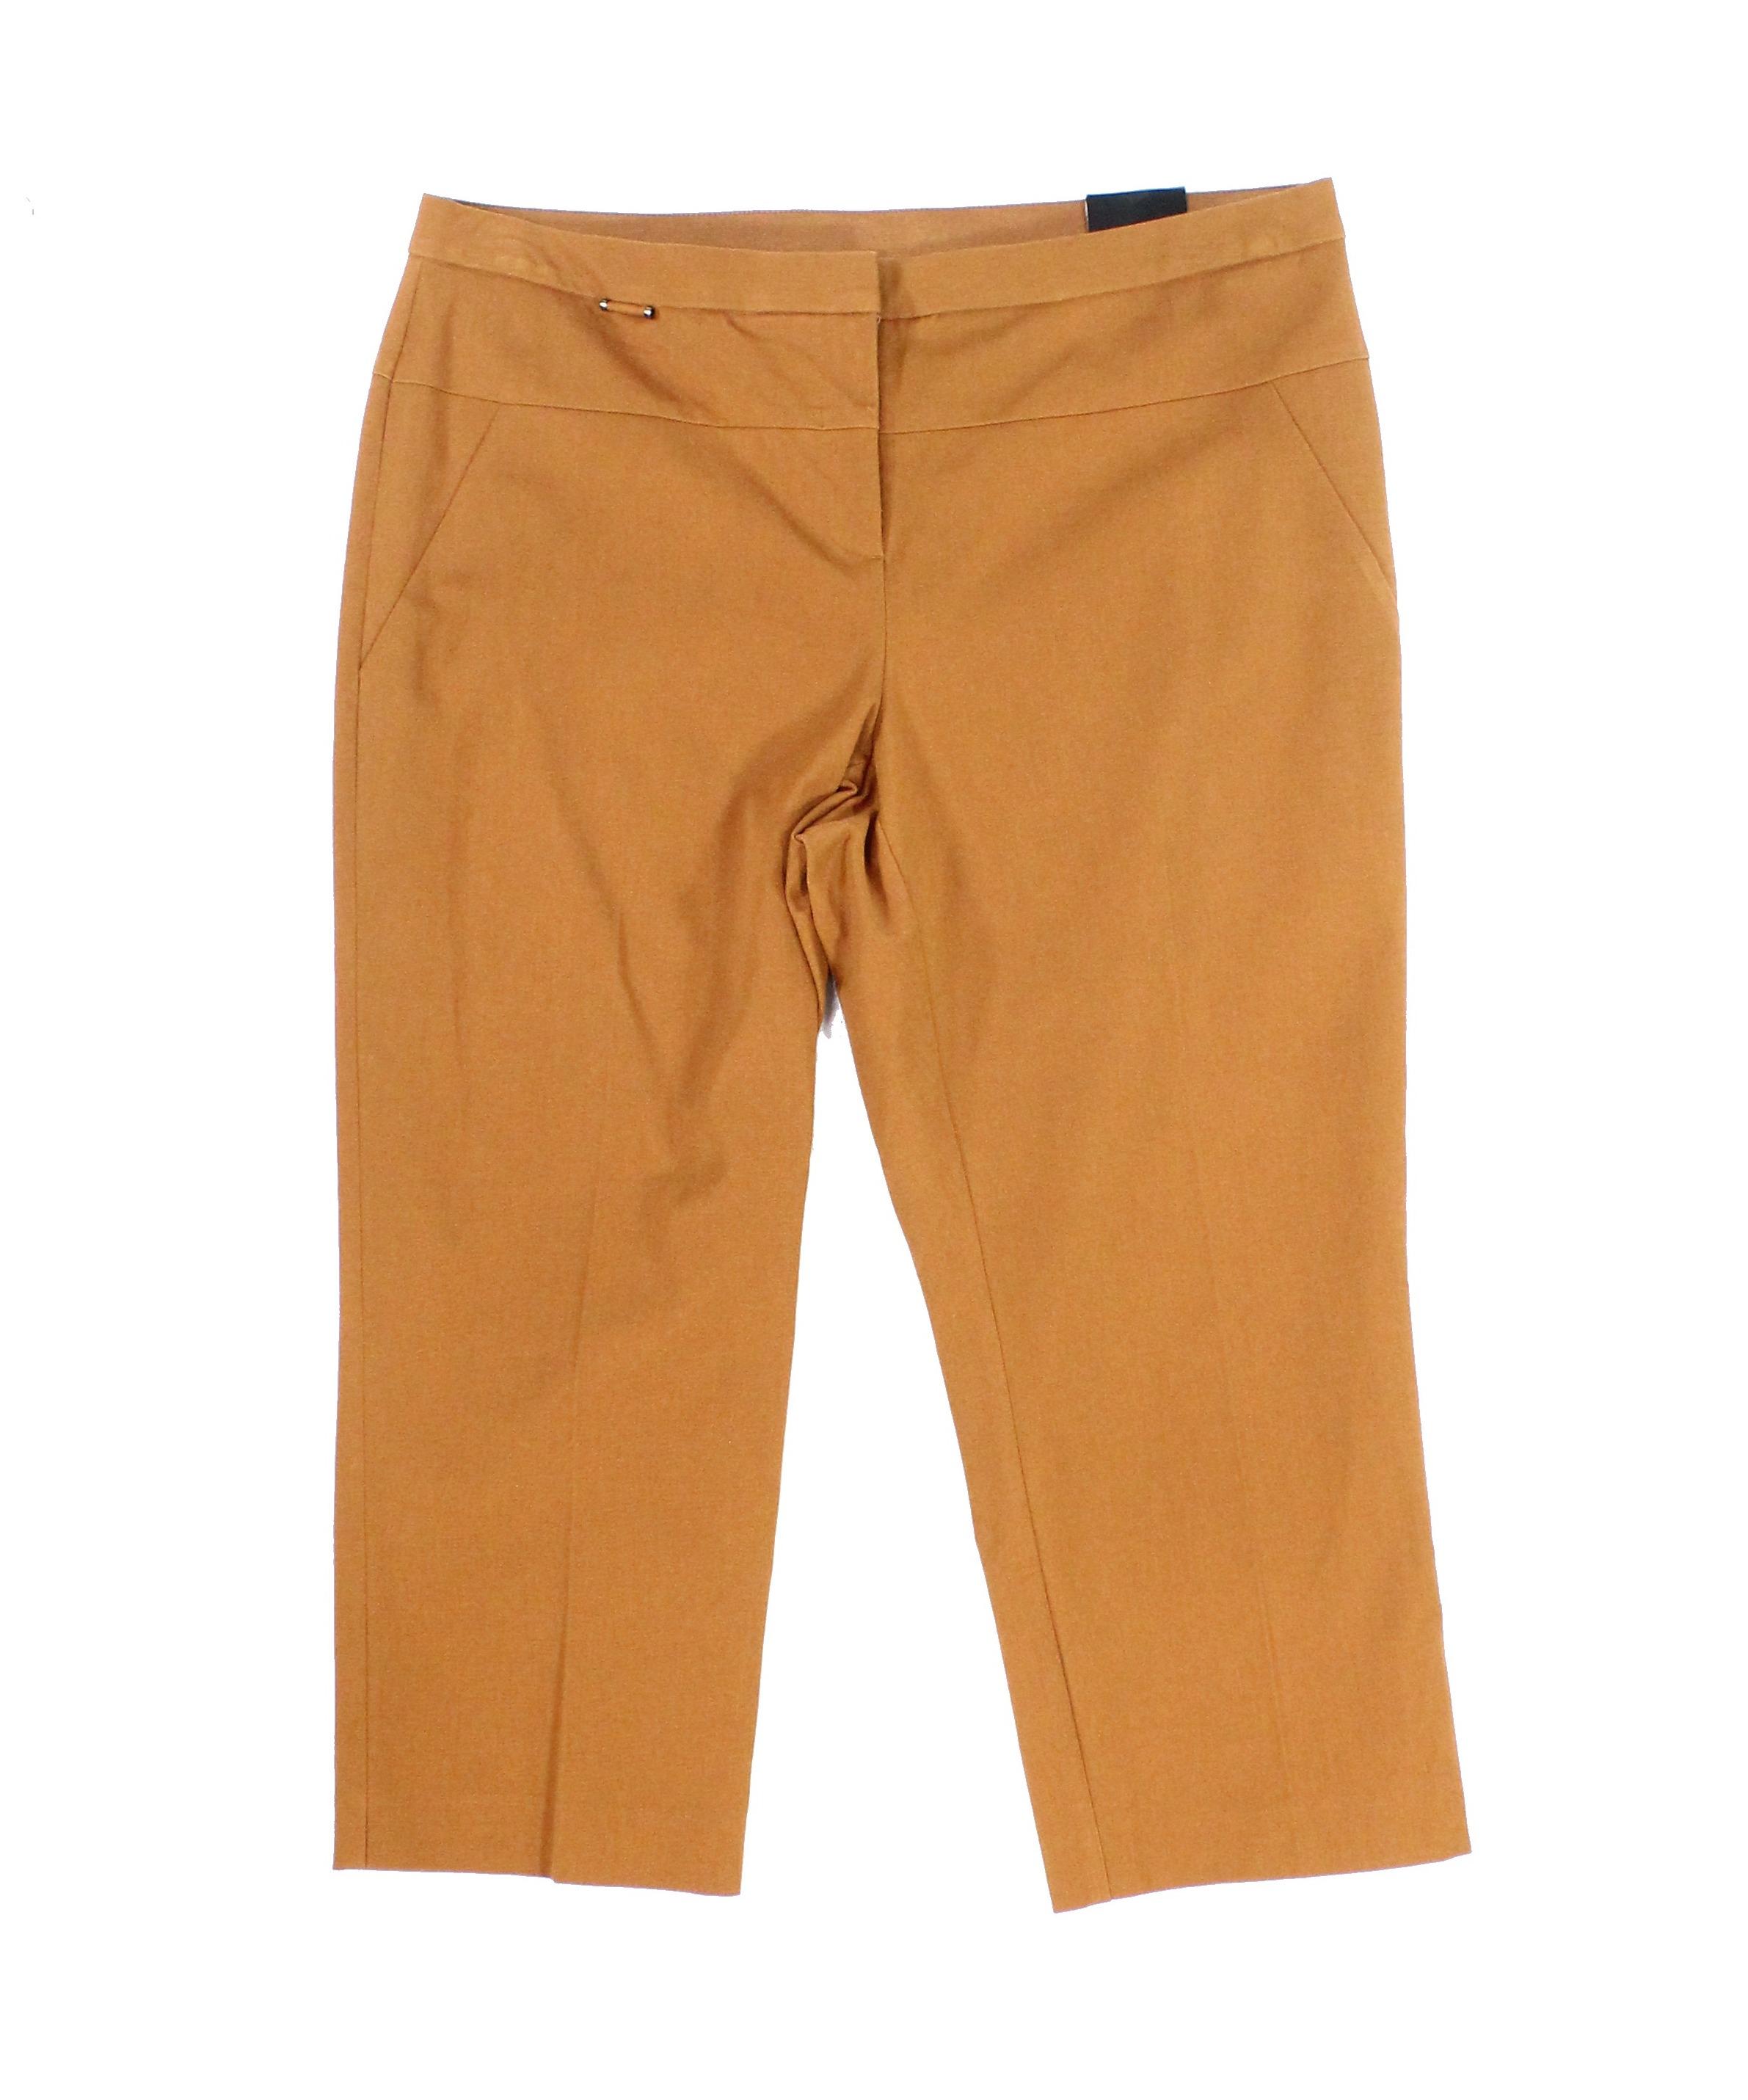 Alfani NEW Sienna Brown Womens Size 4 Tab-Front Seamed Capri Pants